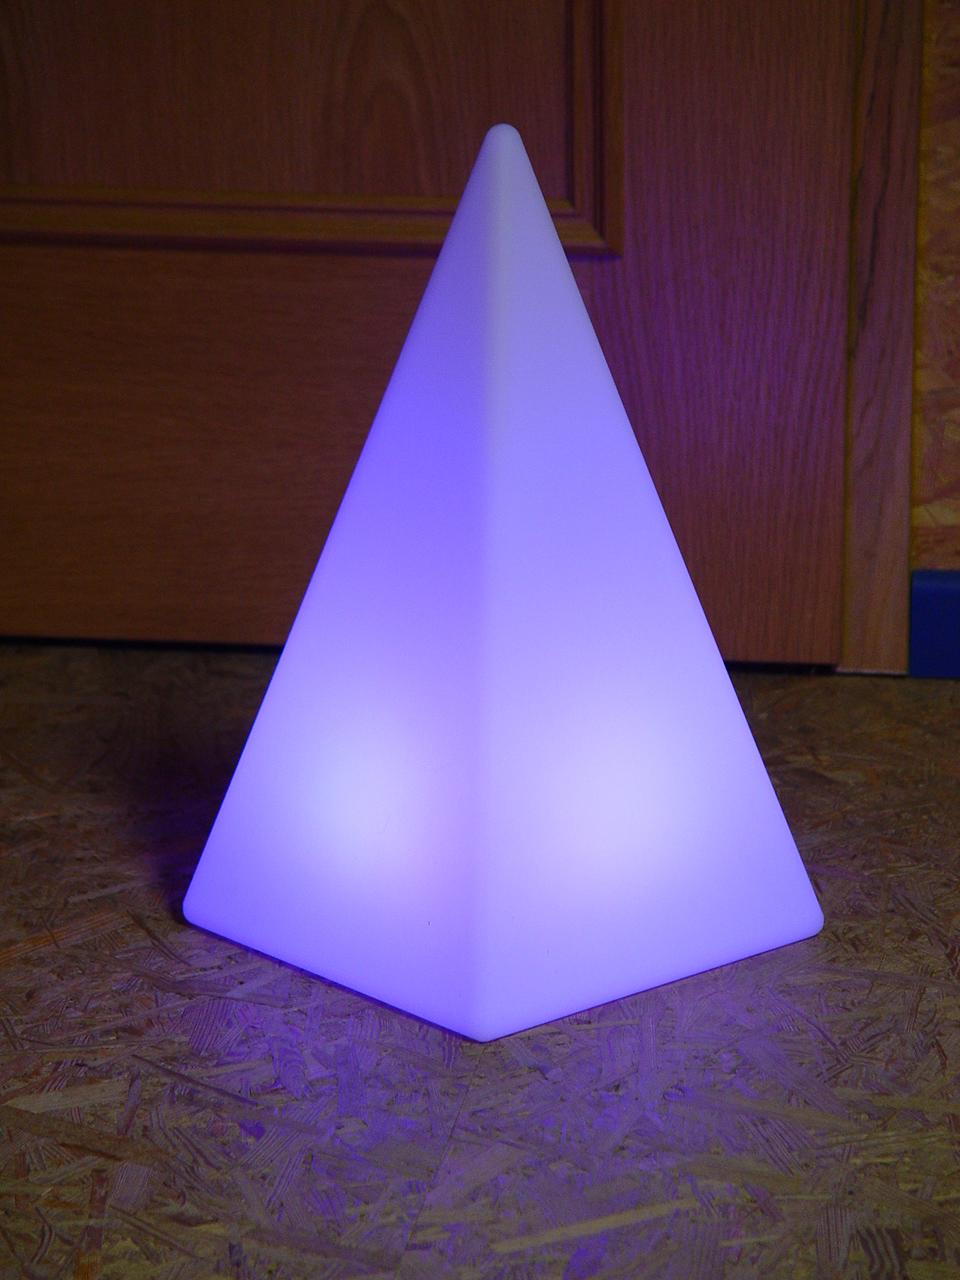 akku led pyramide h he 48 cm tagesmiete mieten. Black Bedroom Furniture Sets. Home Design Ideas